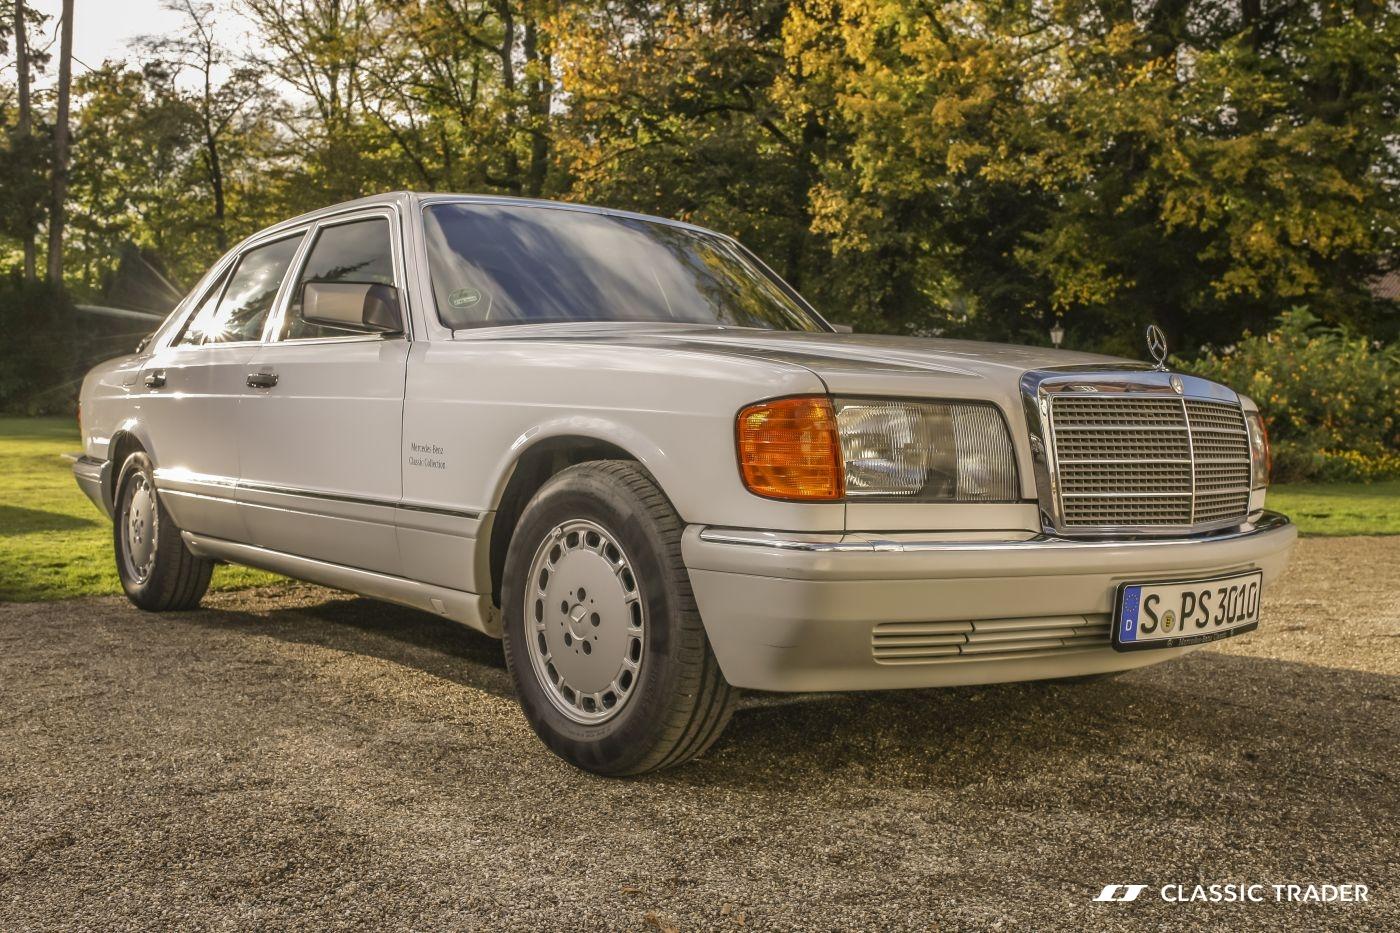 Mercedes-Benz W 126 S Klasse 300 SE (19)